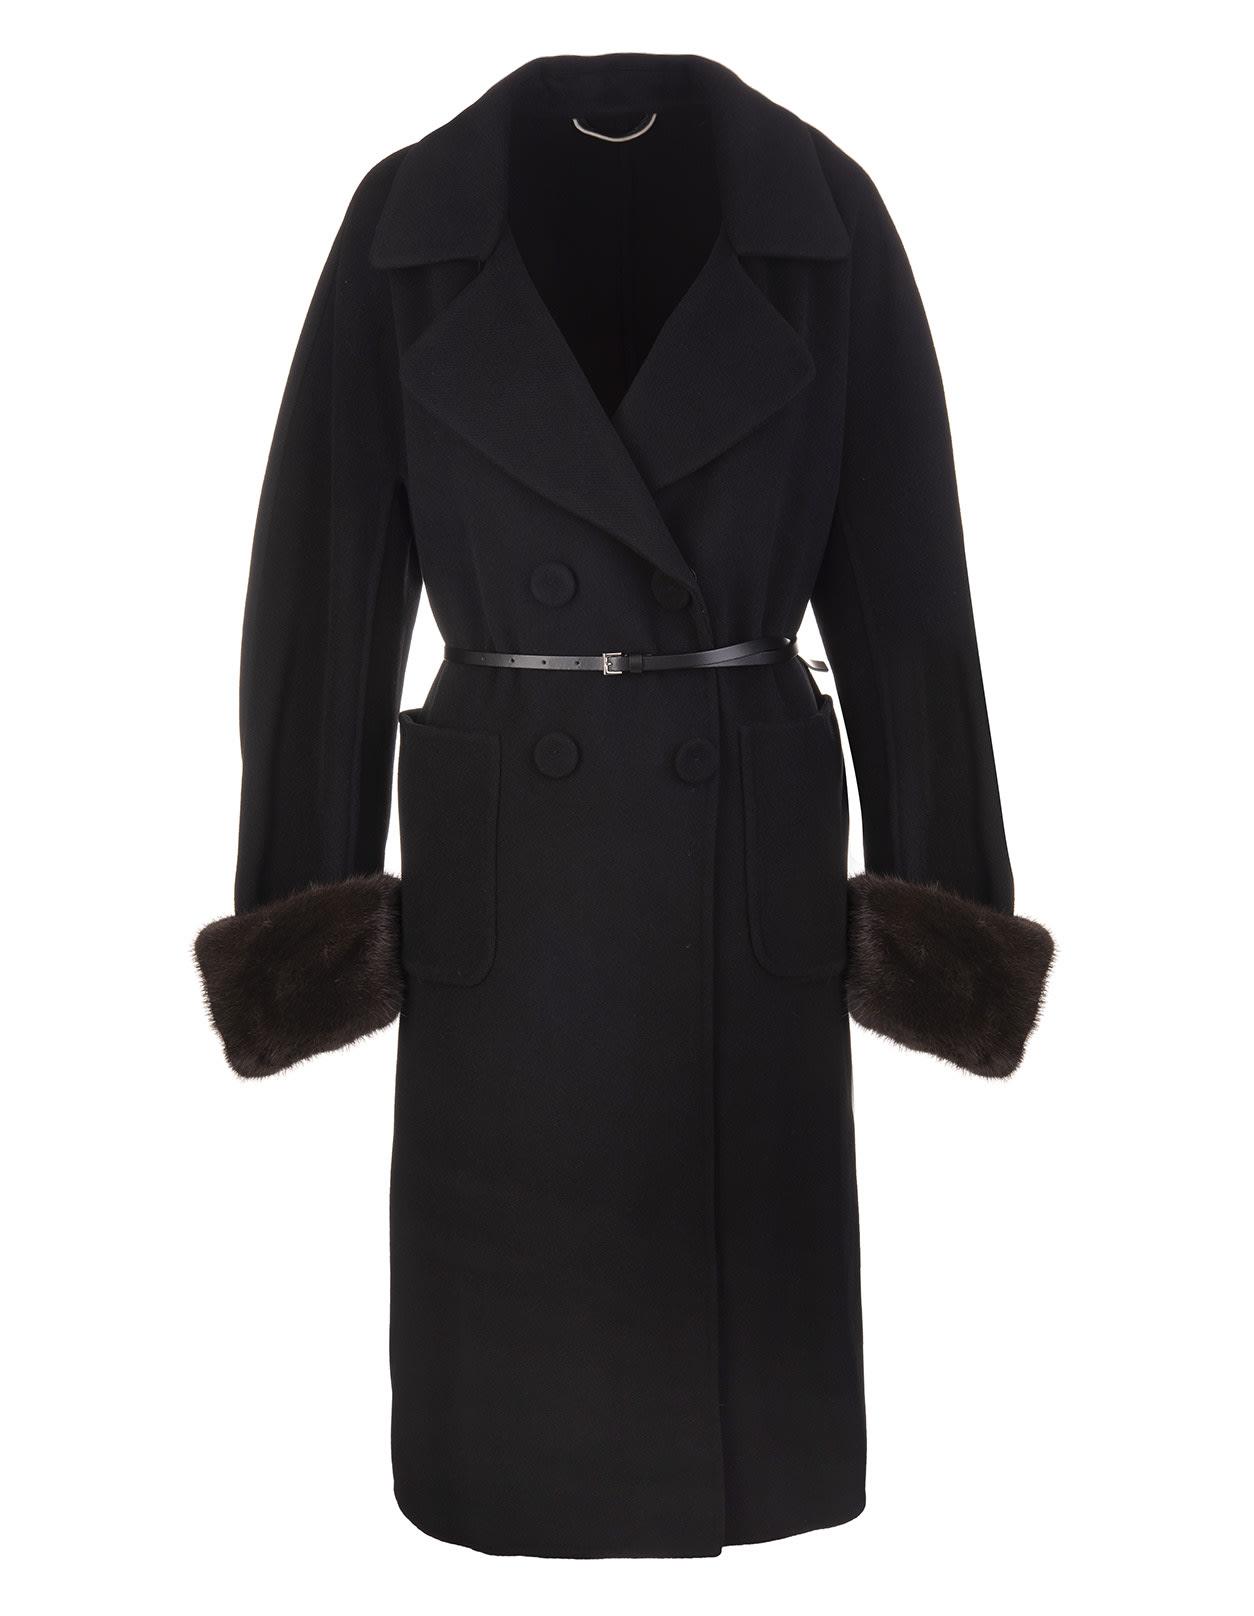 Long Black Coat In Wool And Mink